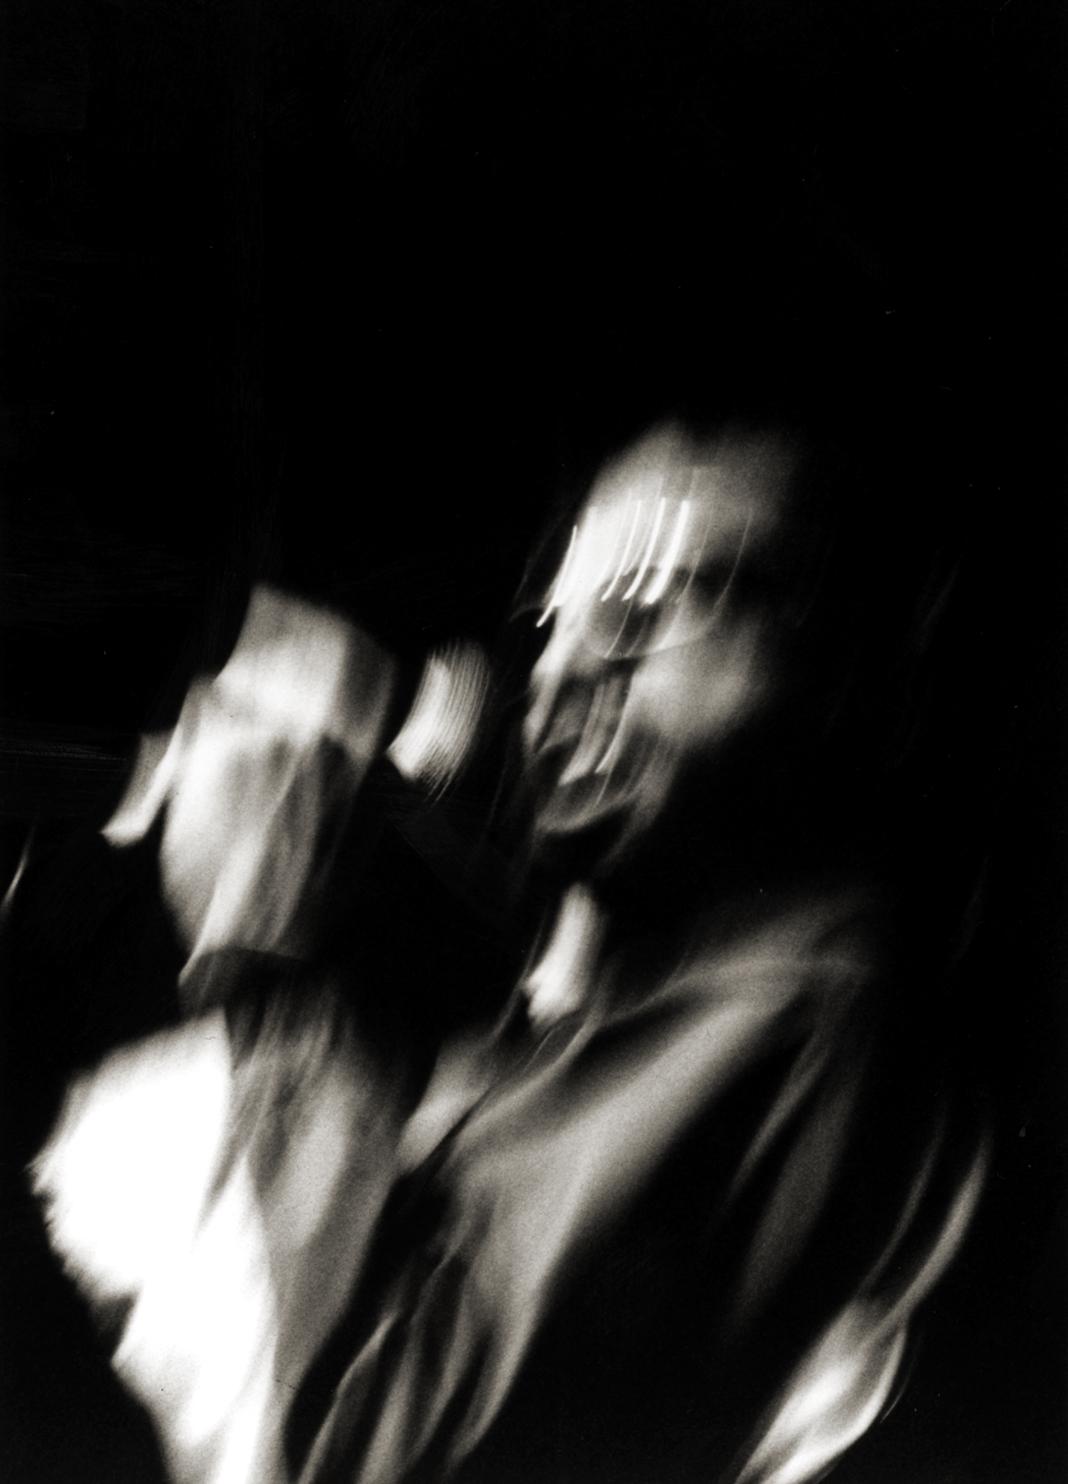 HR of Bad Brains, Maritime Hall, SF, CA 6/20/98